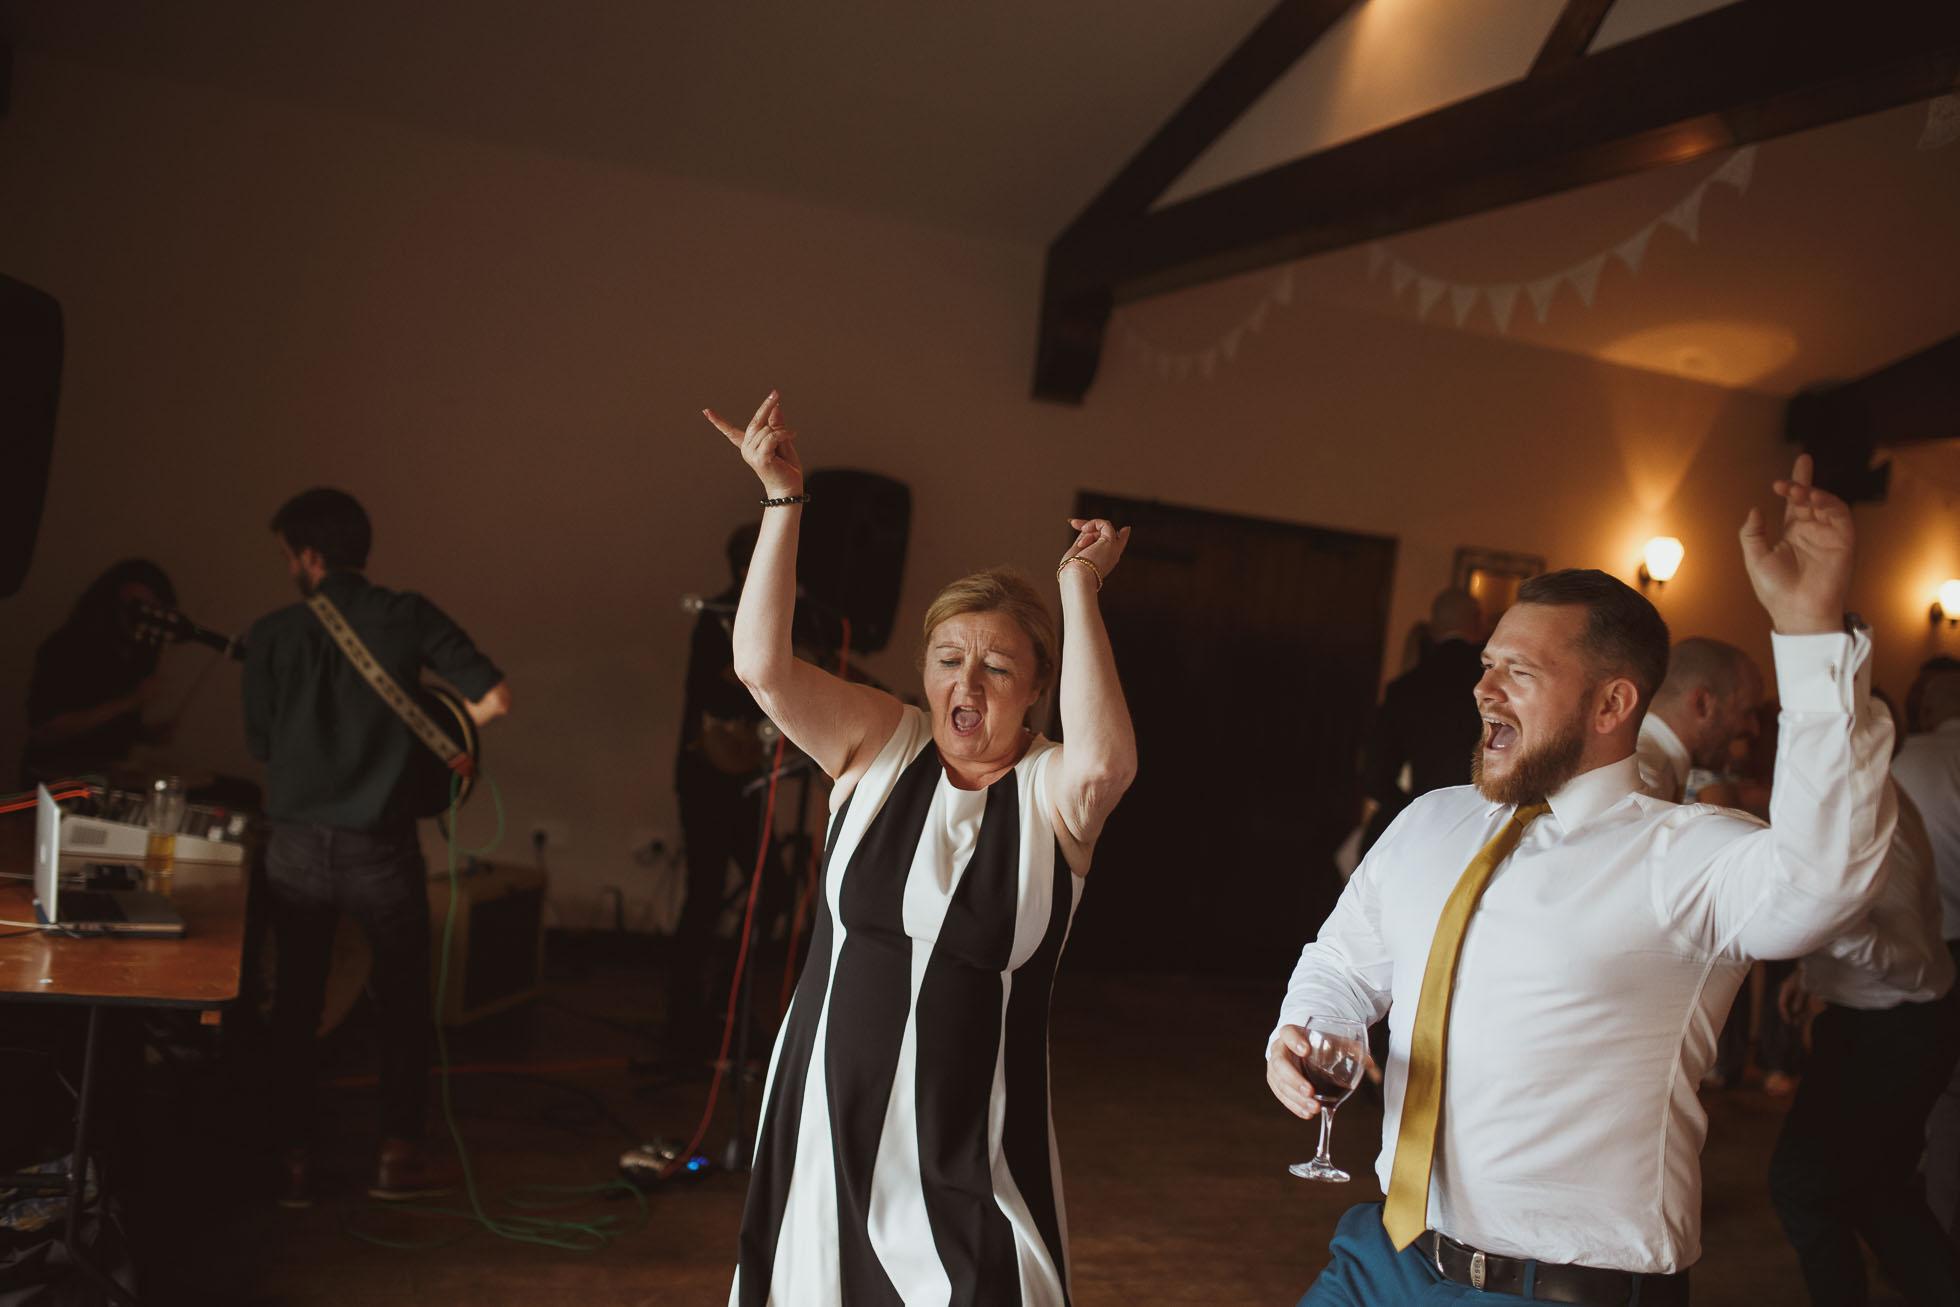 ox pasture hall wedding photographer-110.jpg